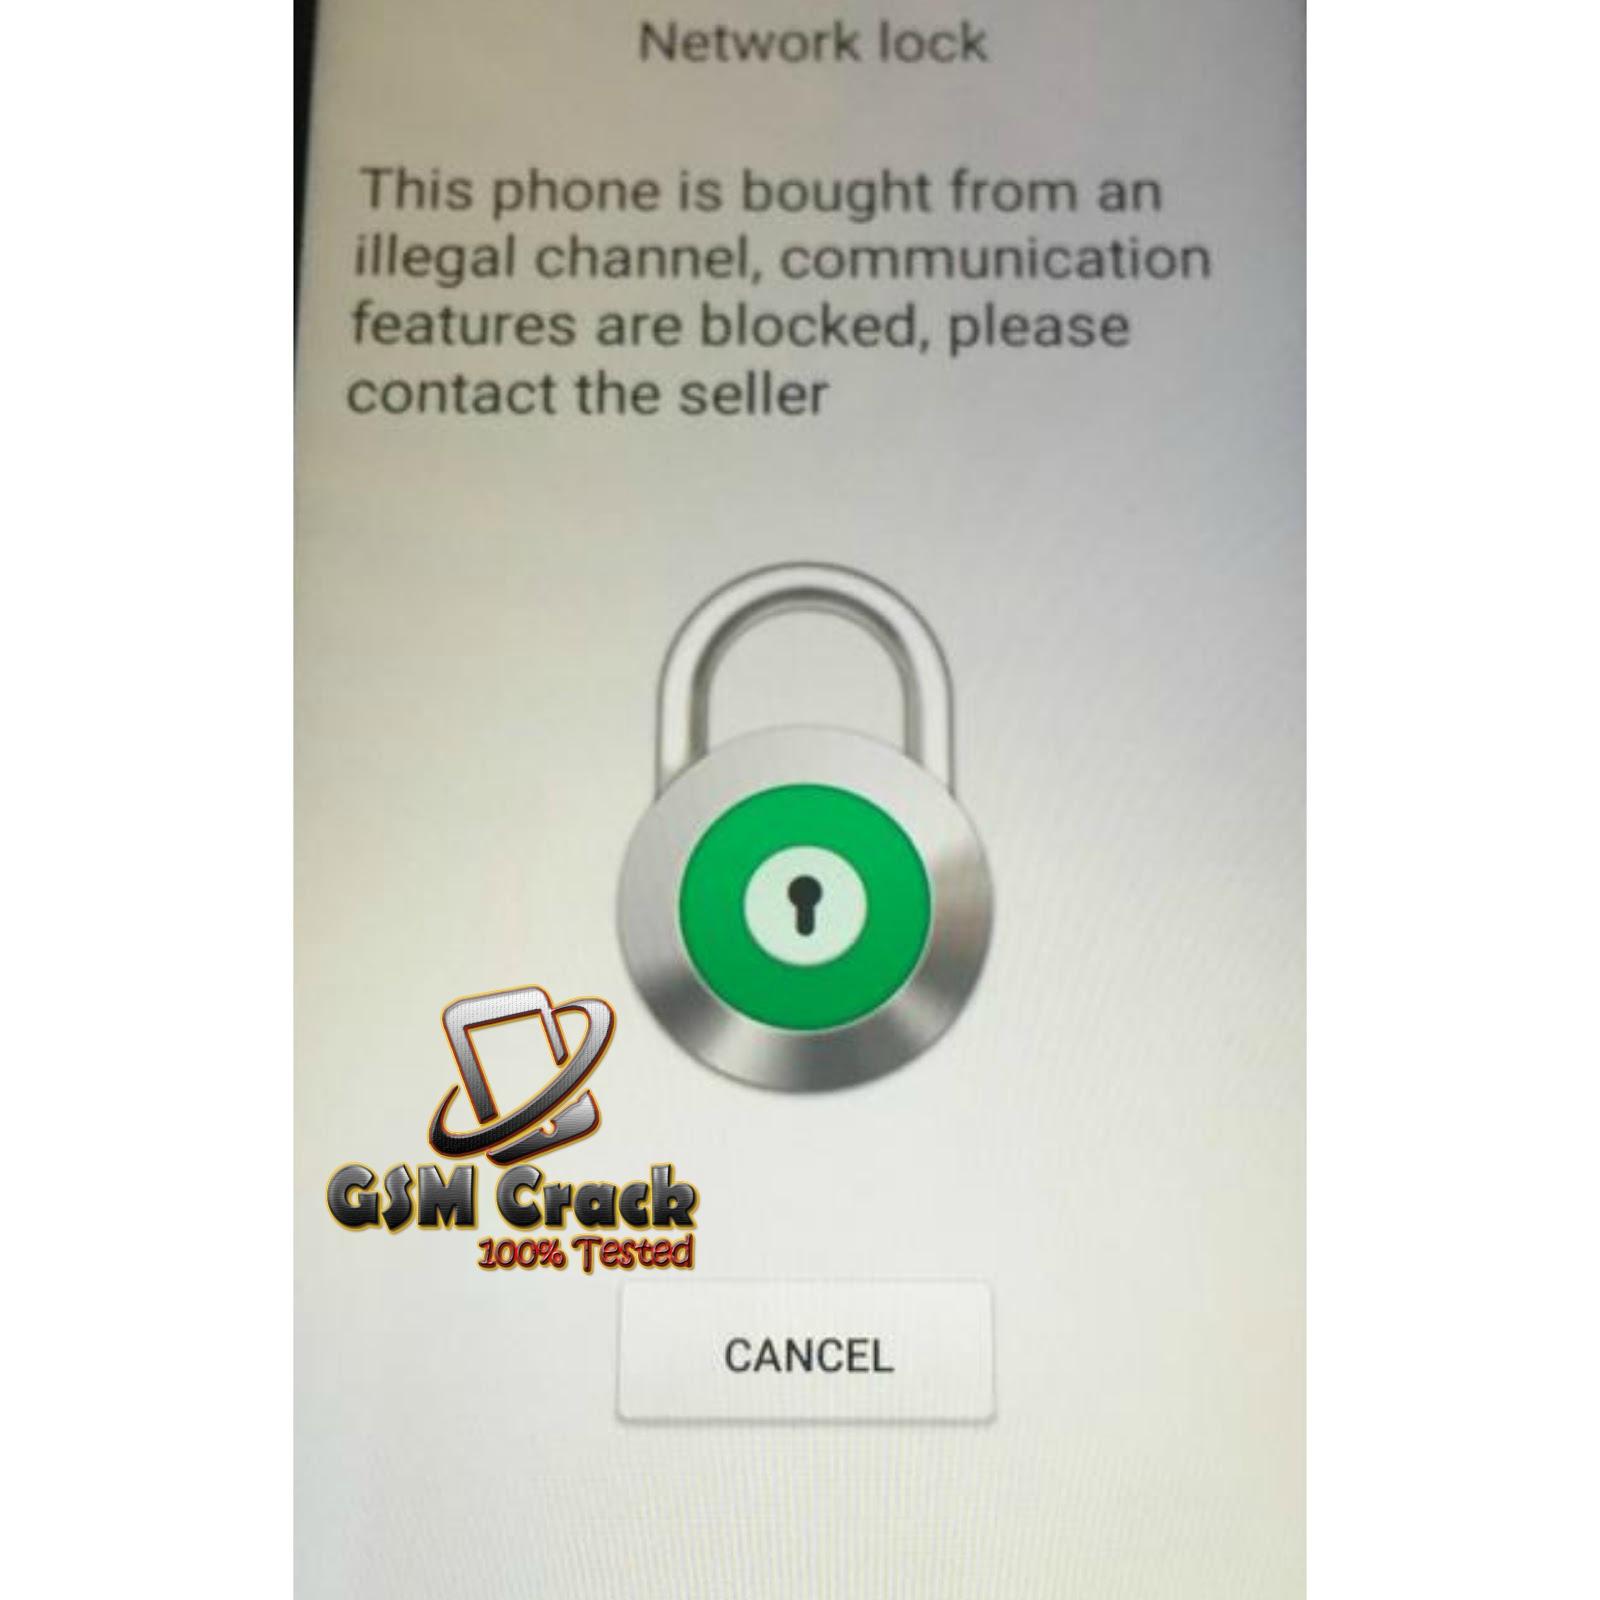 Oppo A3s (CPH1803) Network Unlock Demo Unlock Code 100